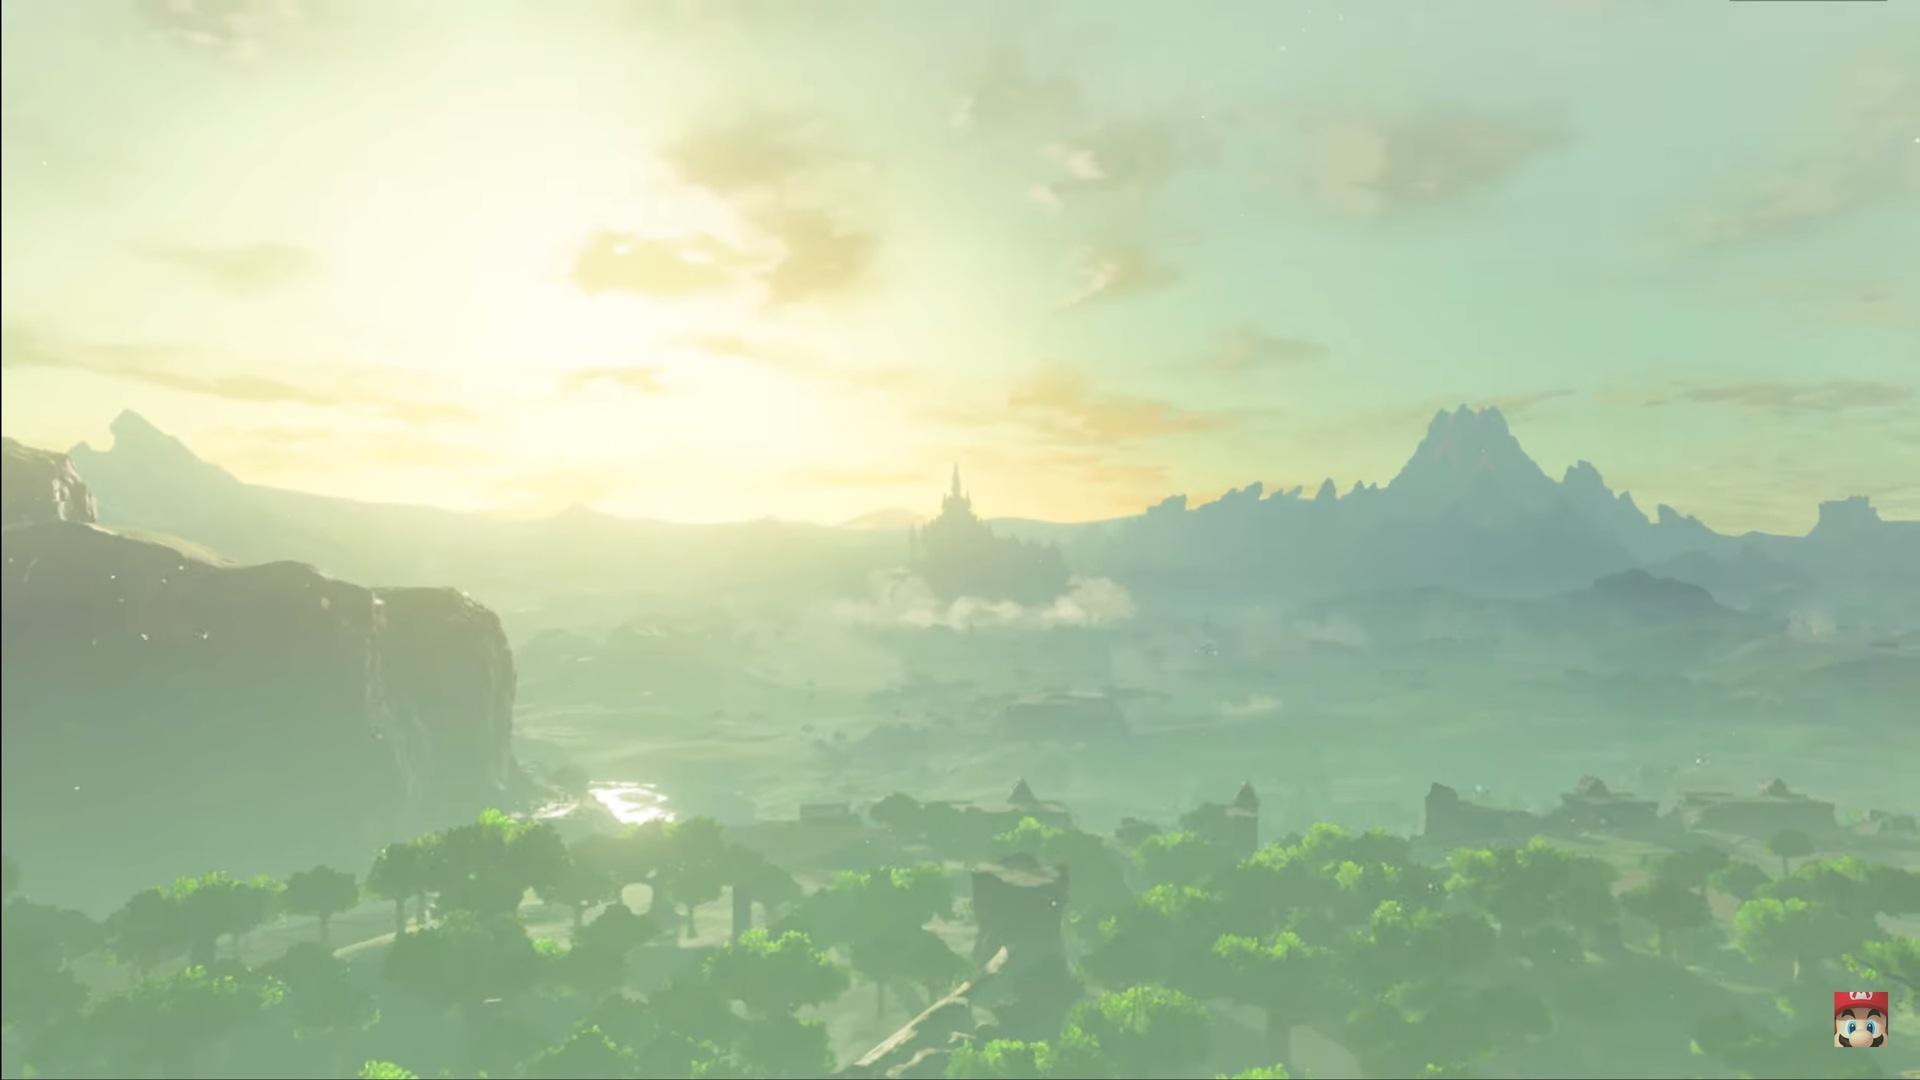 The Legend of Zelda Breath of the Wild sequel showing Hyrule.